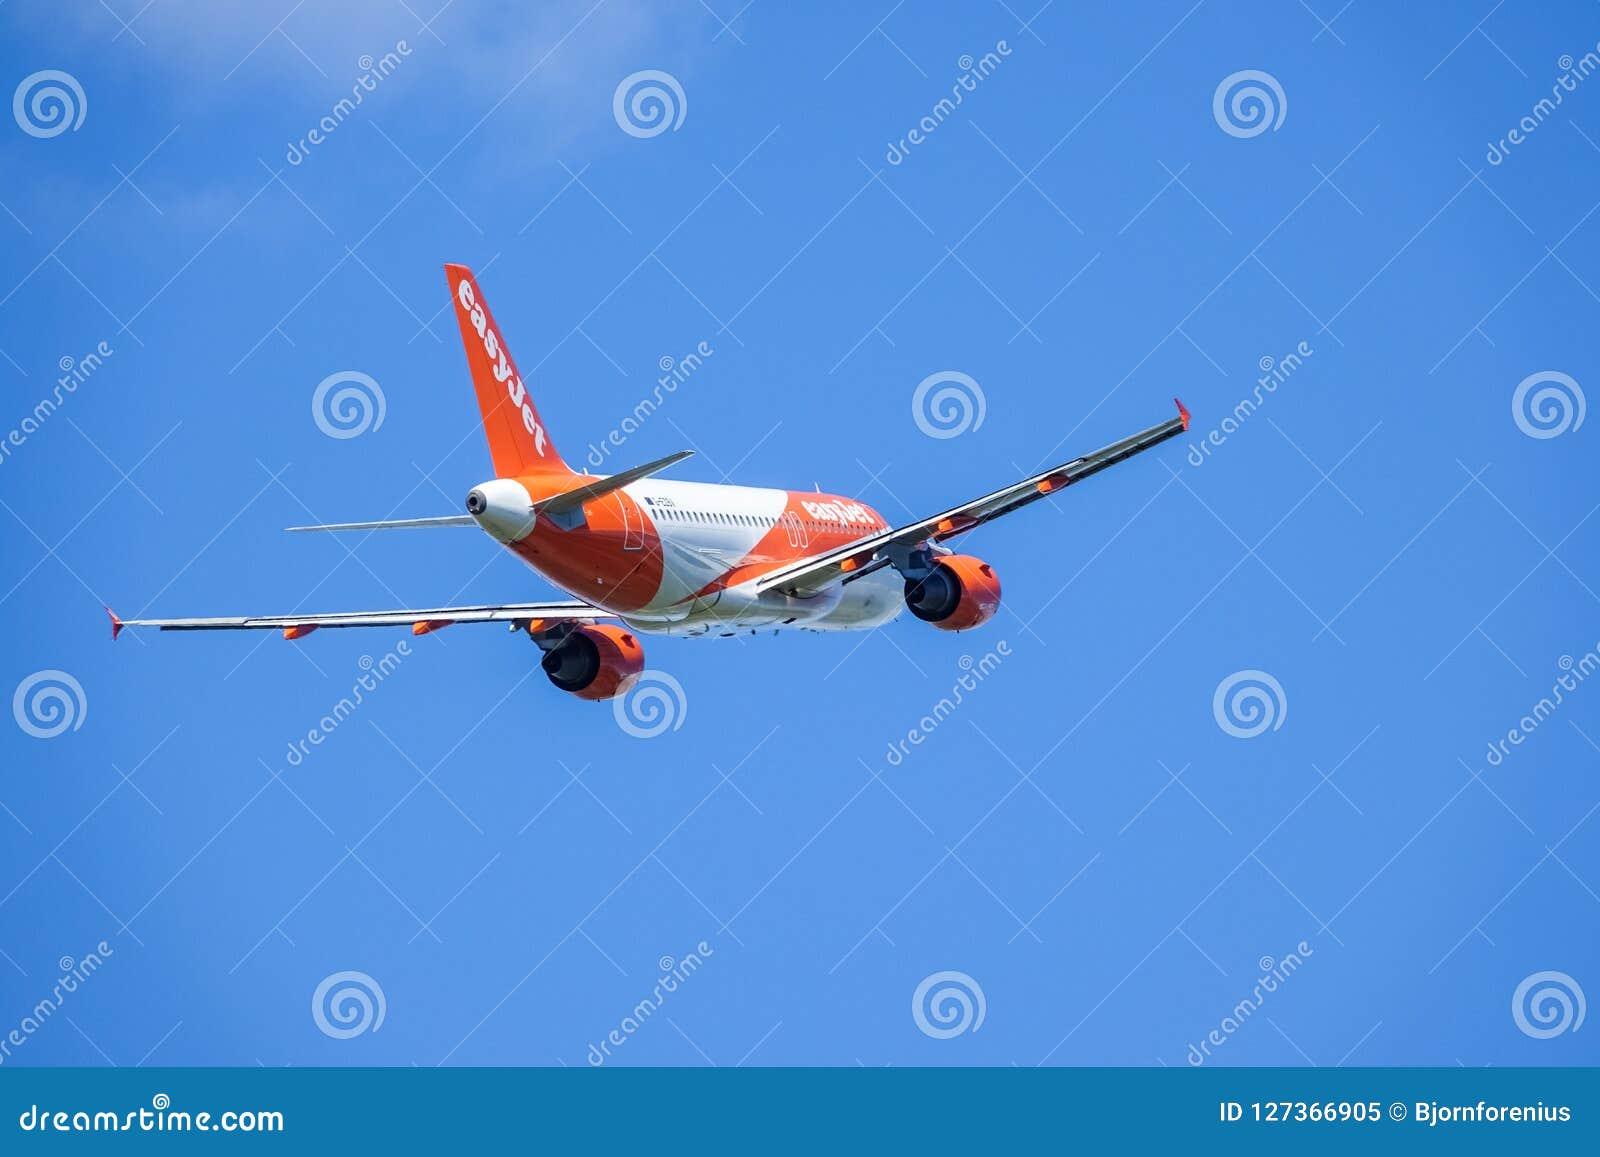 Easyjet, airbus A319 - απογείωση 111 στα άσπρα σύννεφα και μπλε ουρανός